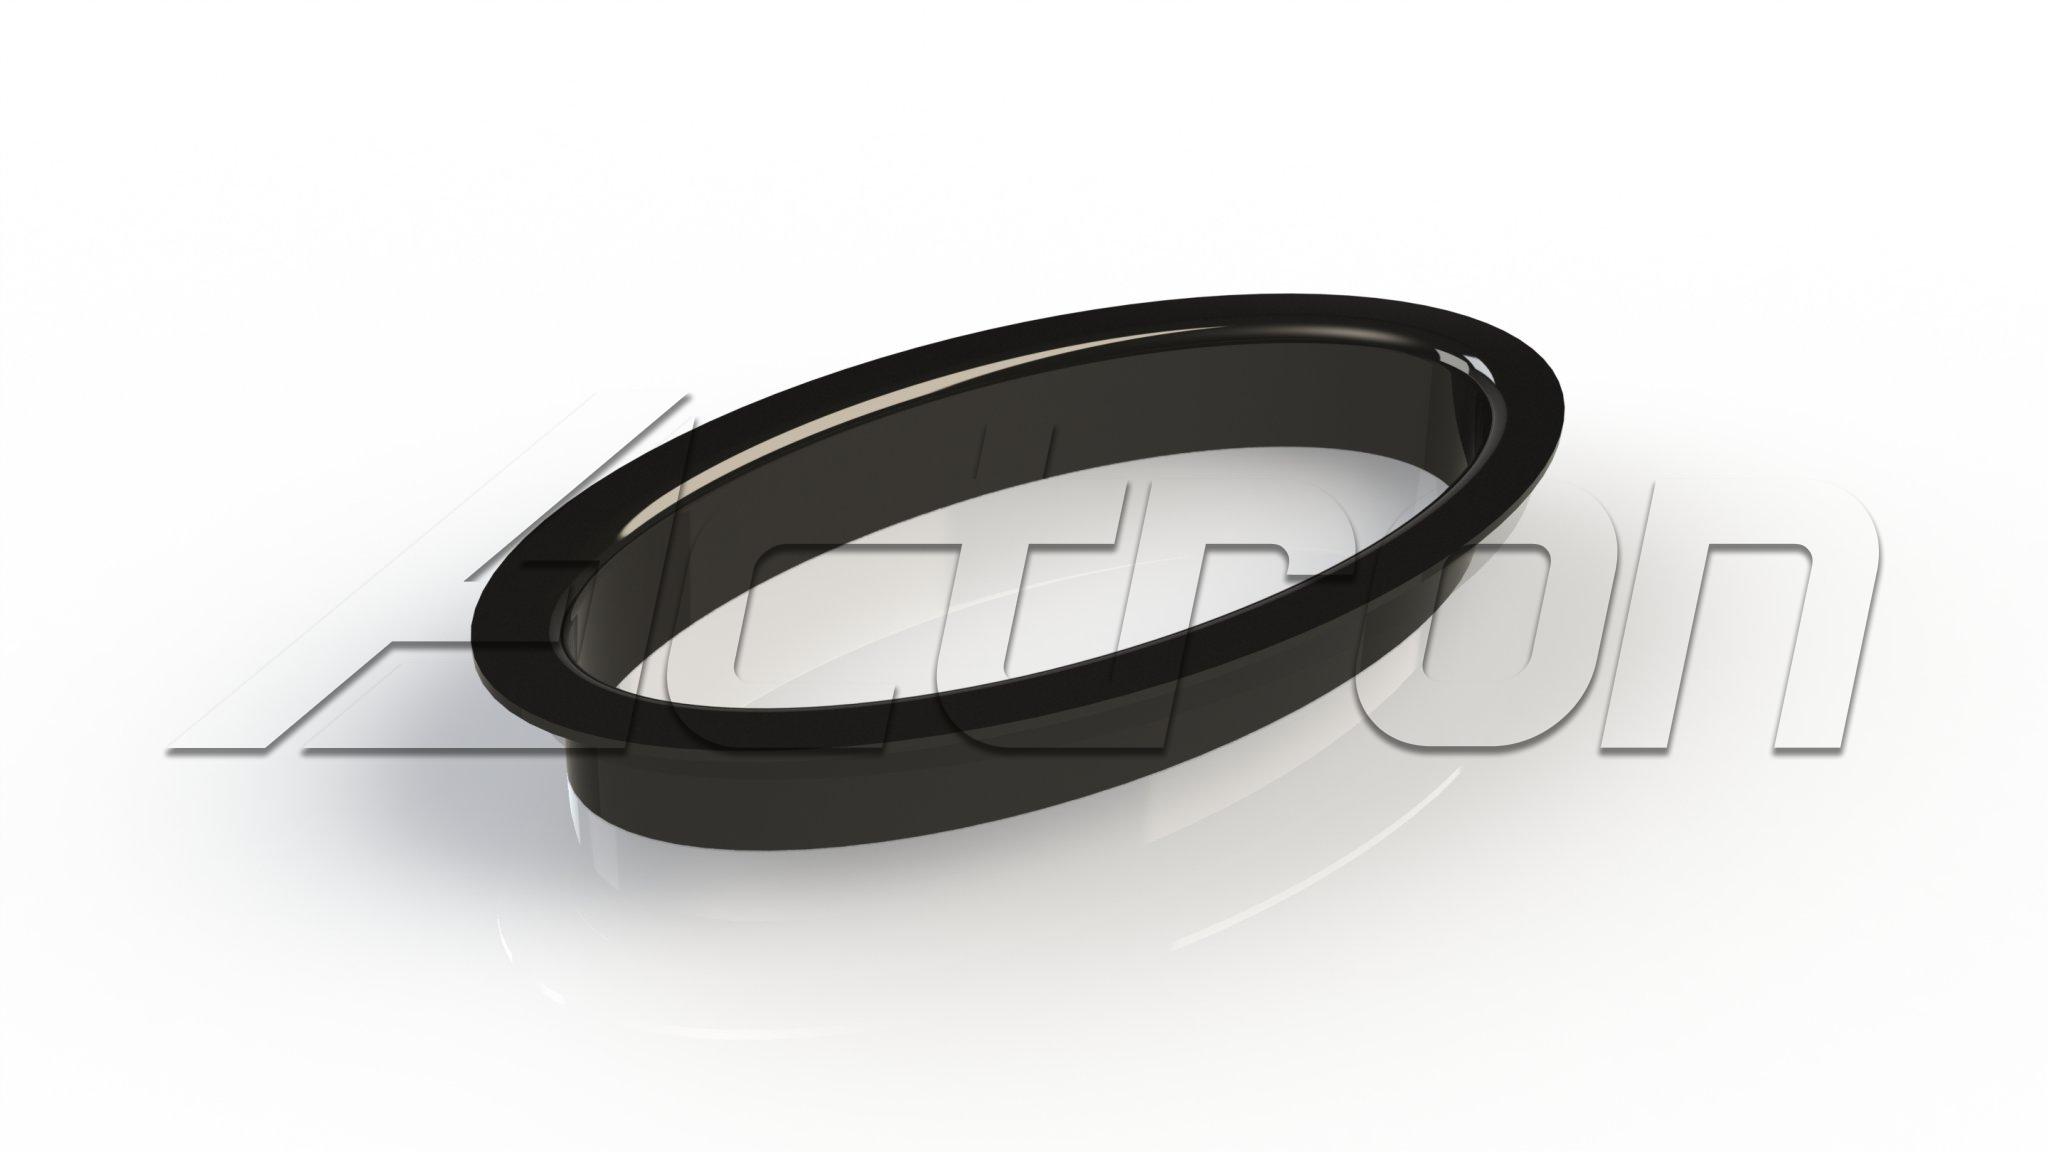 sleeve-8211-trim-5554-a43029.jpg